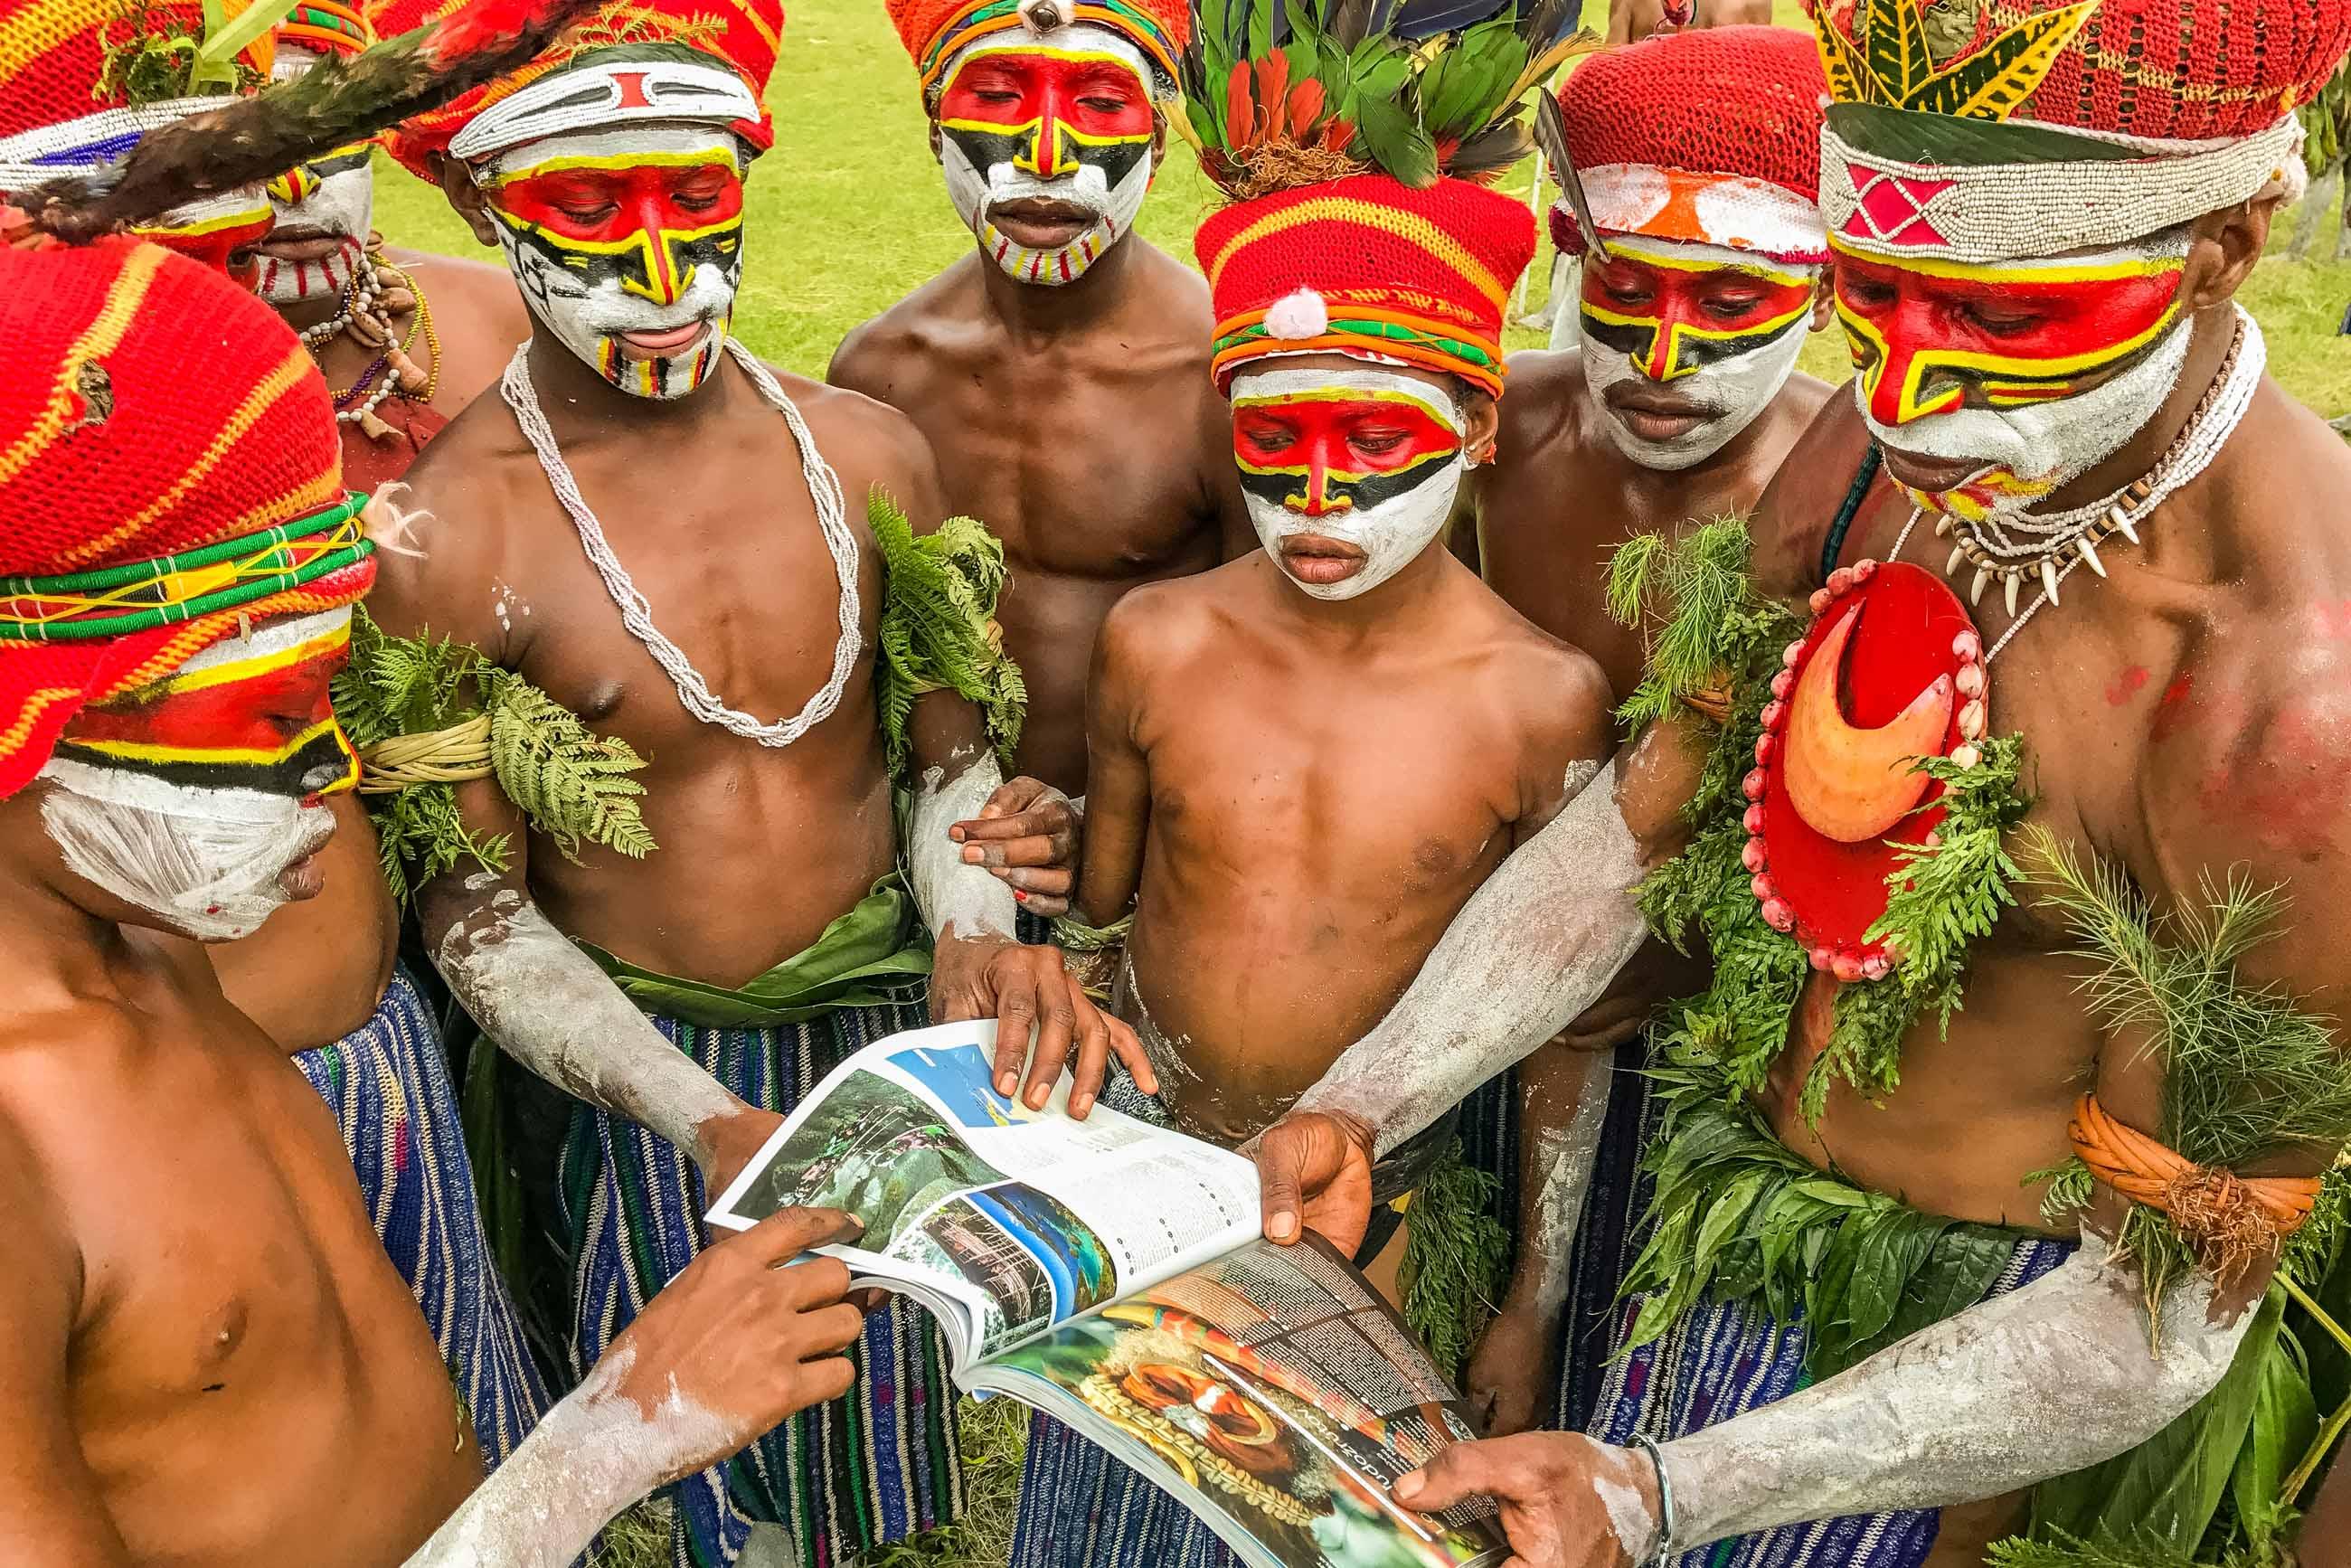 https://bubo.sk/uploads/galleries/7442/lubosfellner_papuanovaguinea-43-.jpg